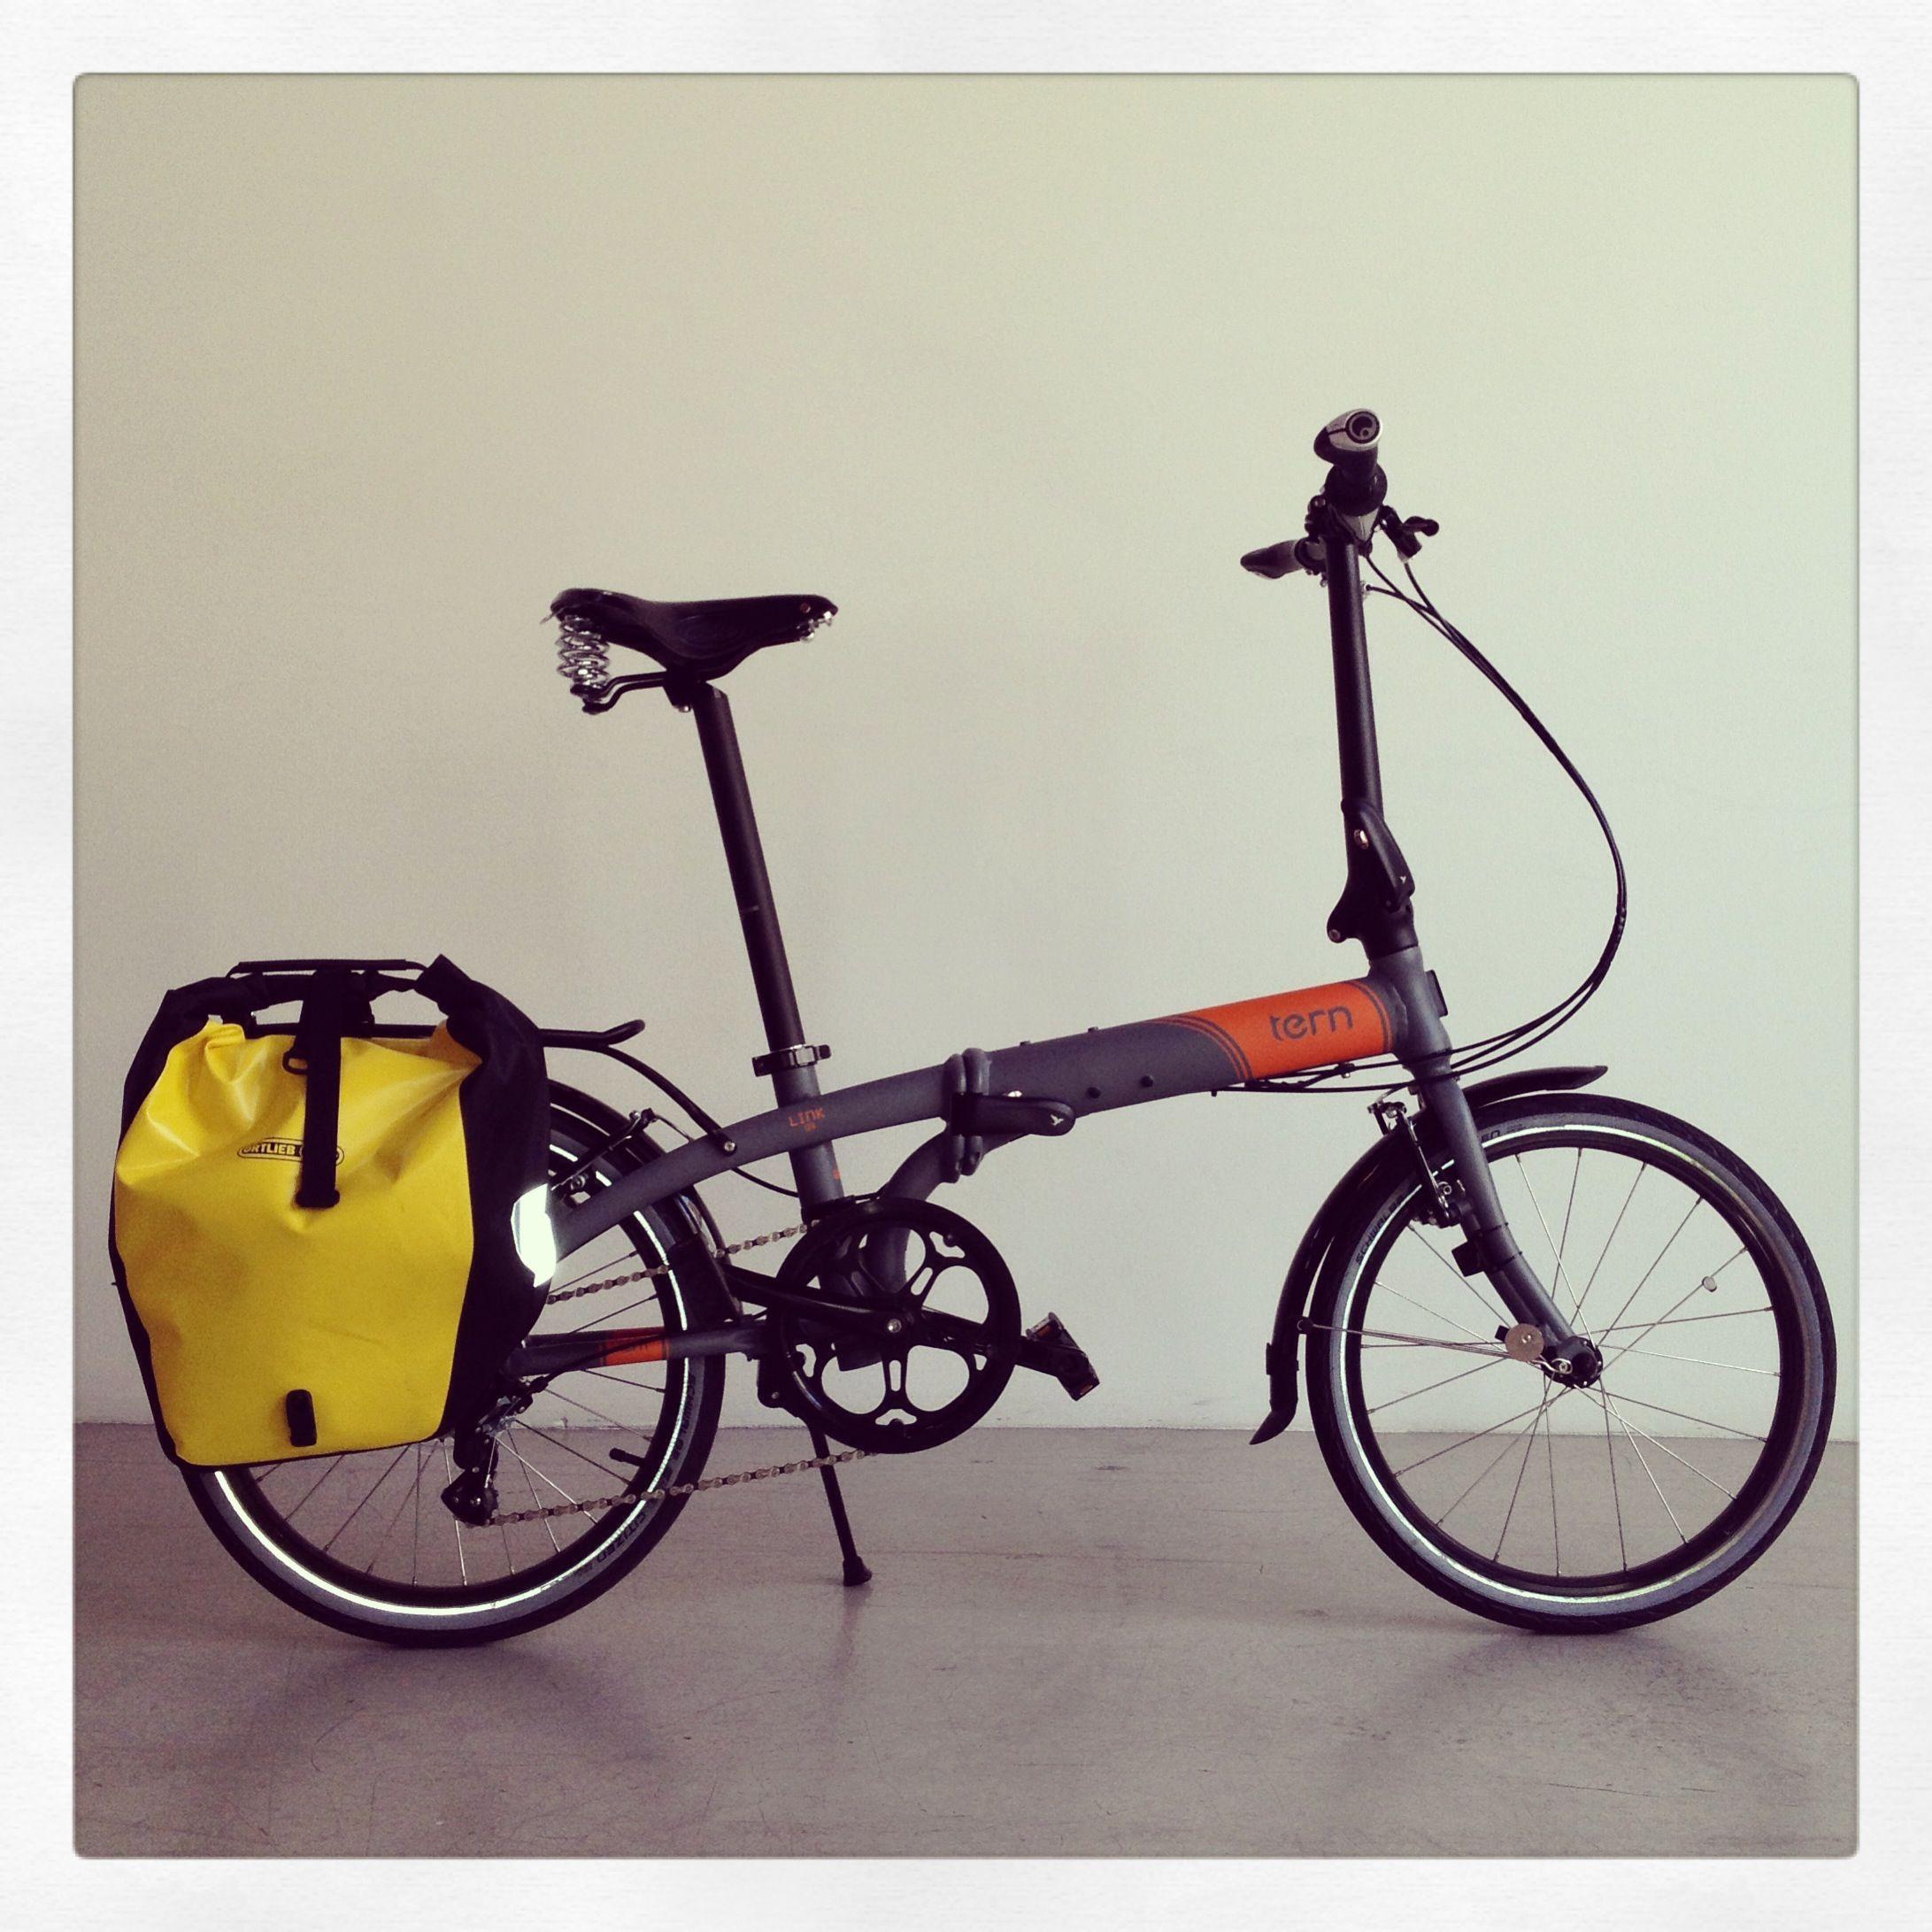 Tern Folding Bicycle Ortlieb Rear Pannier Ergon Grips Brooks Saddle